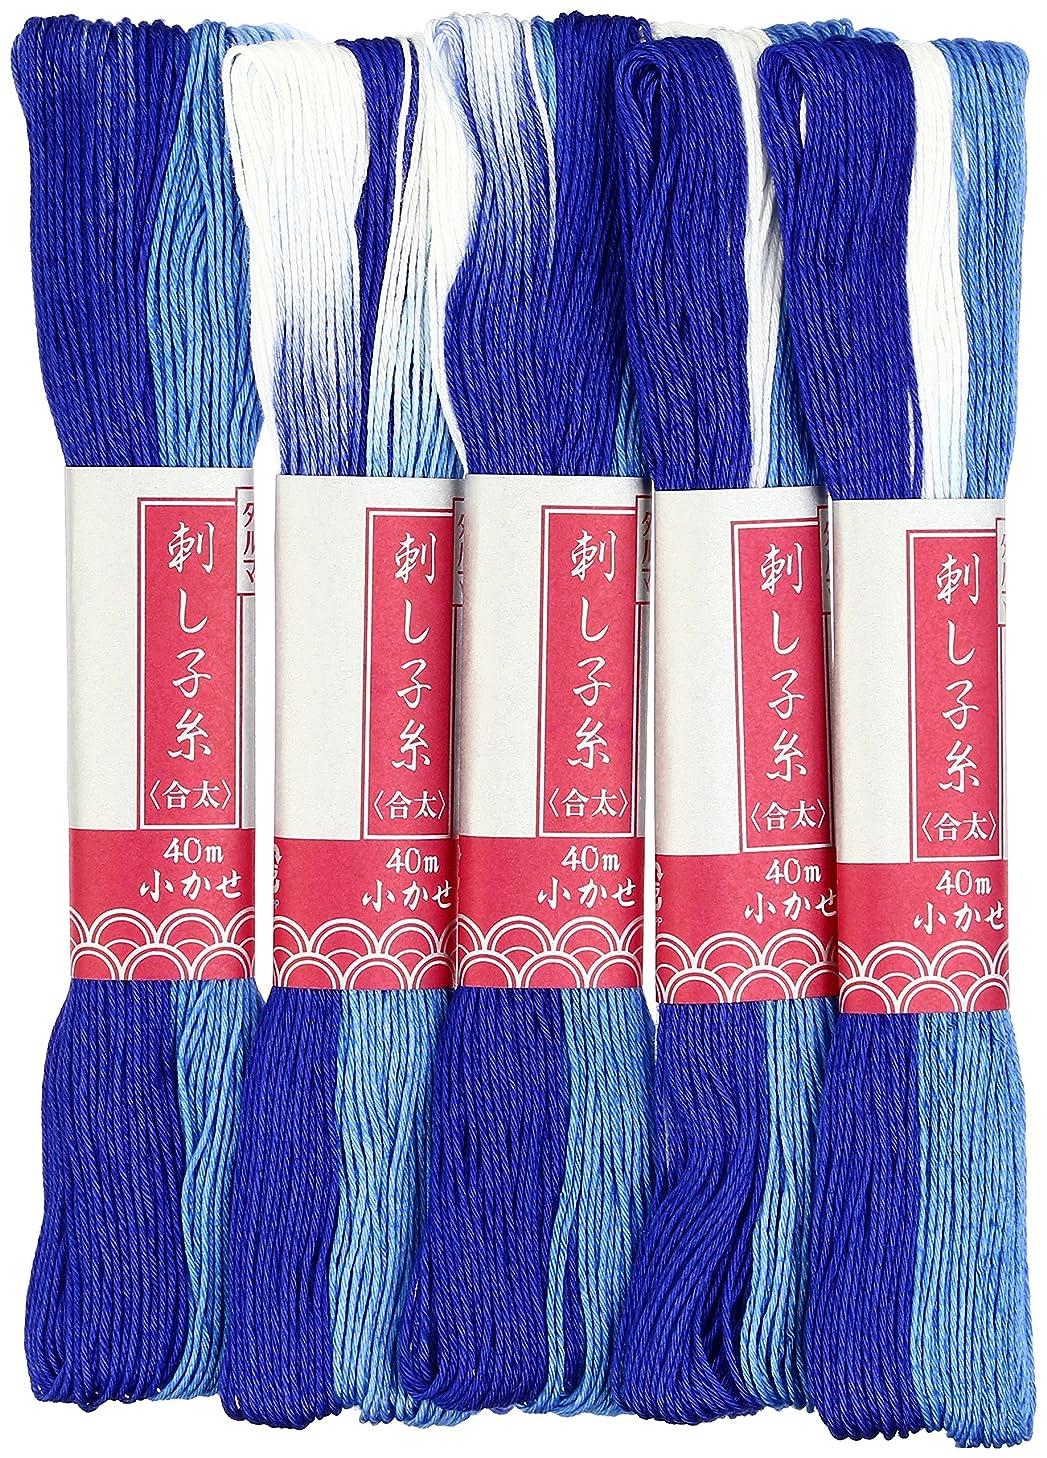 Yokota Daruma Pearl String Thread Dyed Small Fish Stain Dyed 40M Col.53 Blue 01-2190 (japan import)